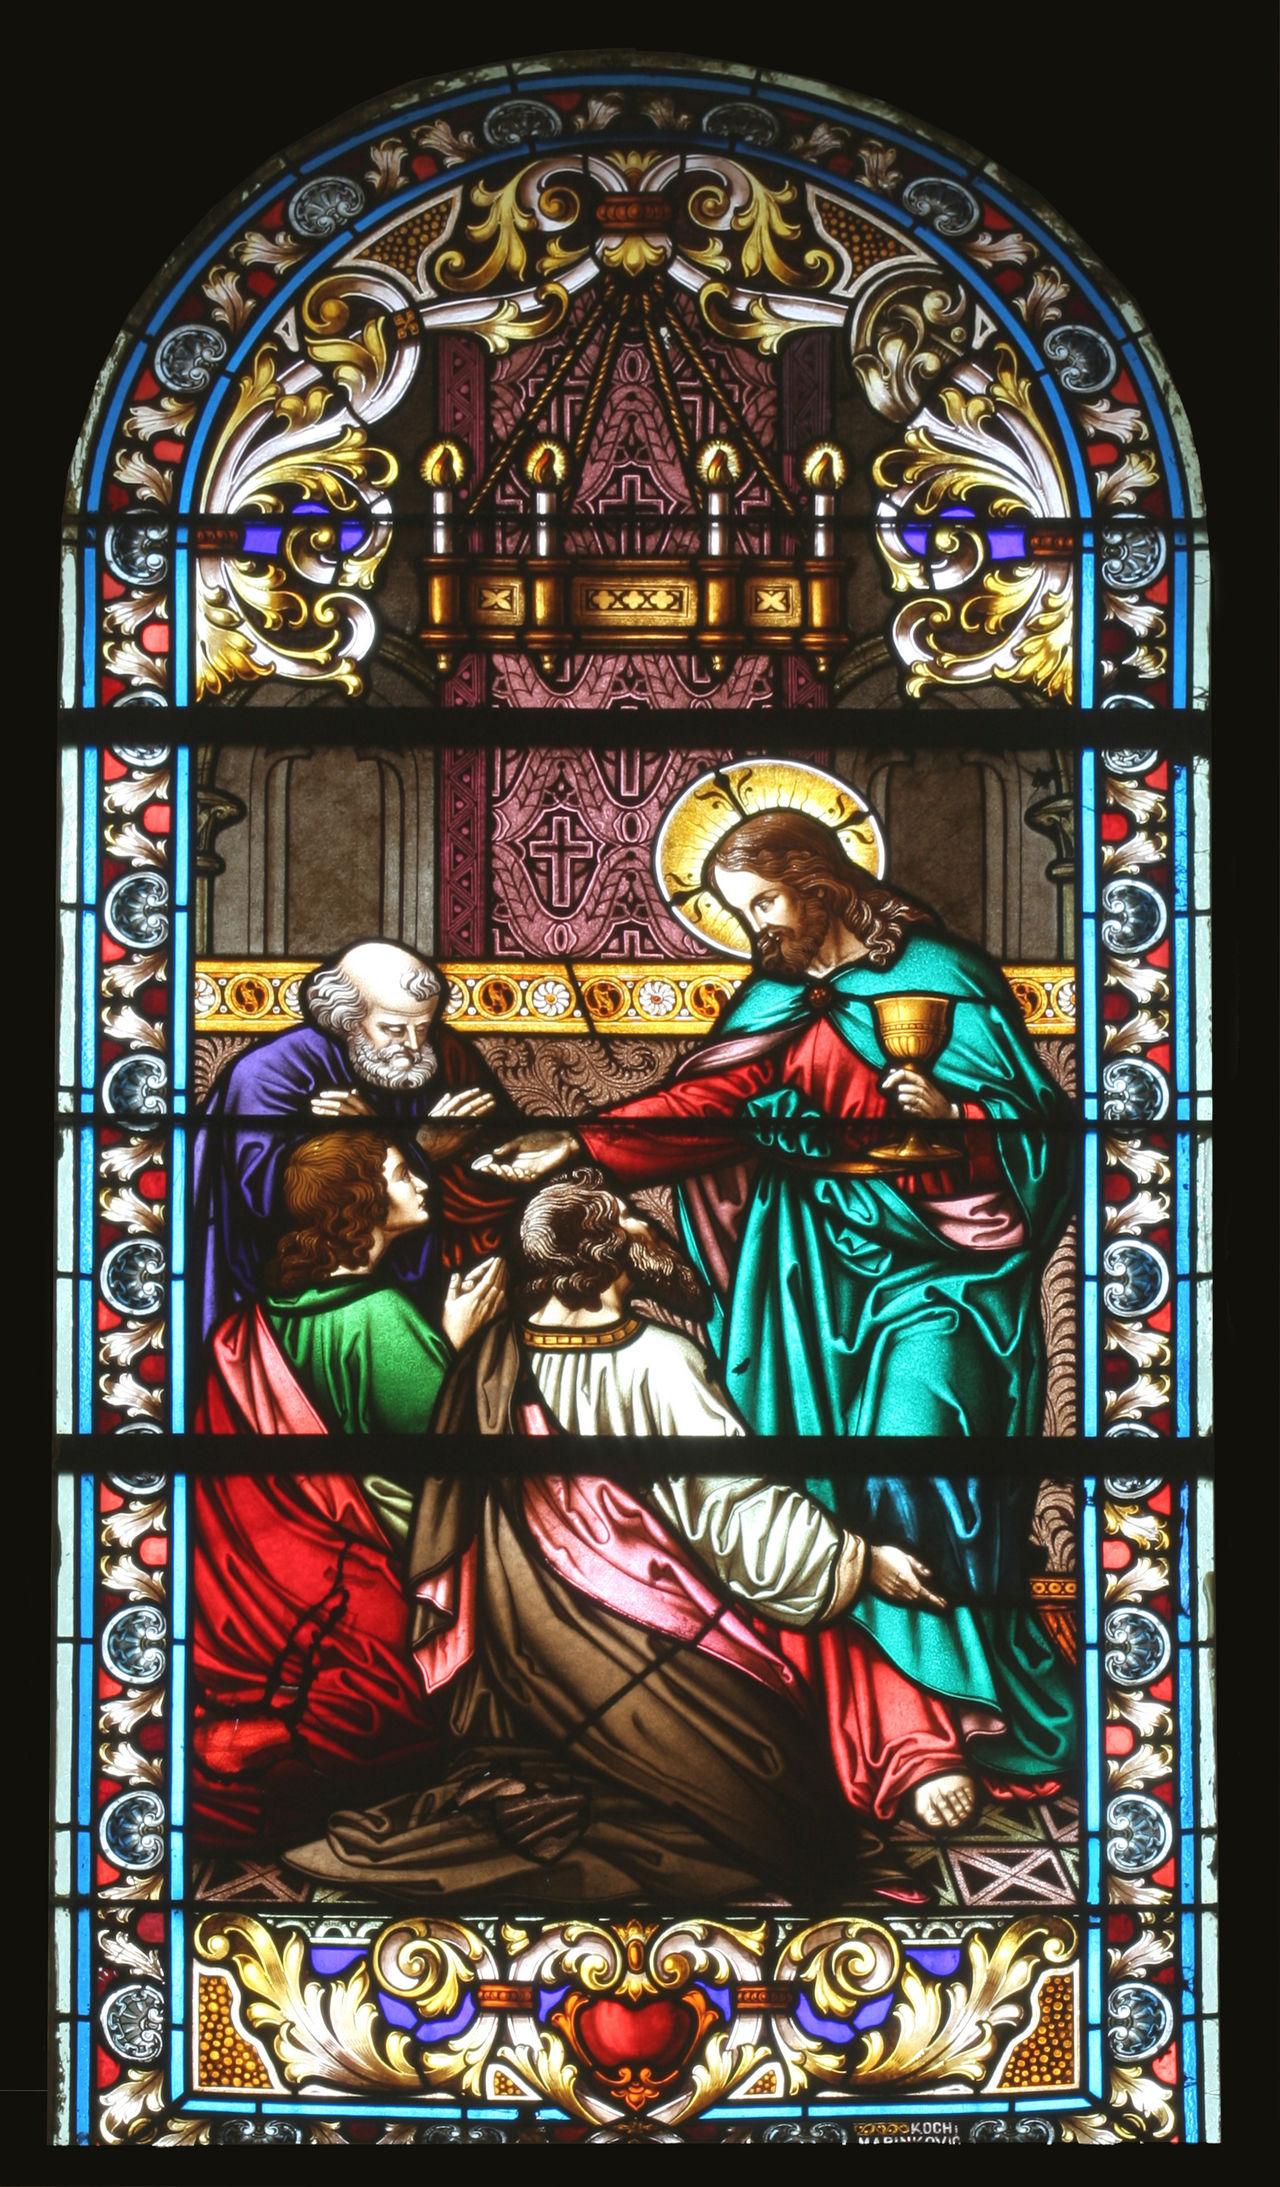 Jesus and the apostles Abbey Apostles Belief Christianity Church Convent Faith Glass Holy Jesus Patron Place Of Worship Religion Religious  Sacred Saint Spiritual Stained Window Windowpane Worship